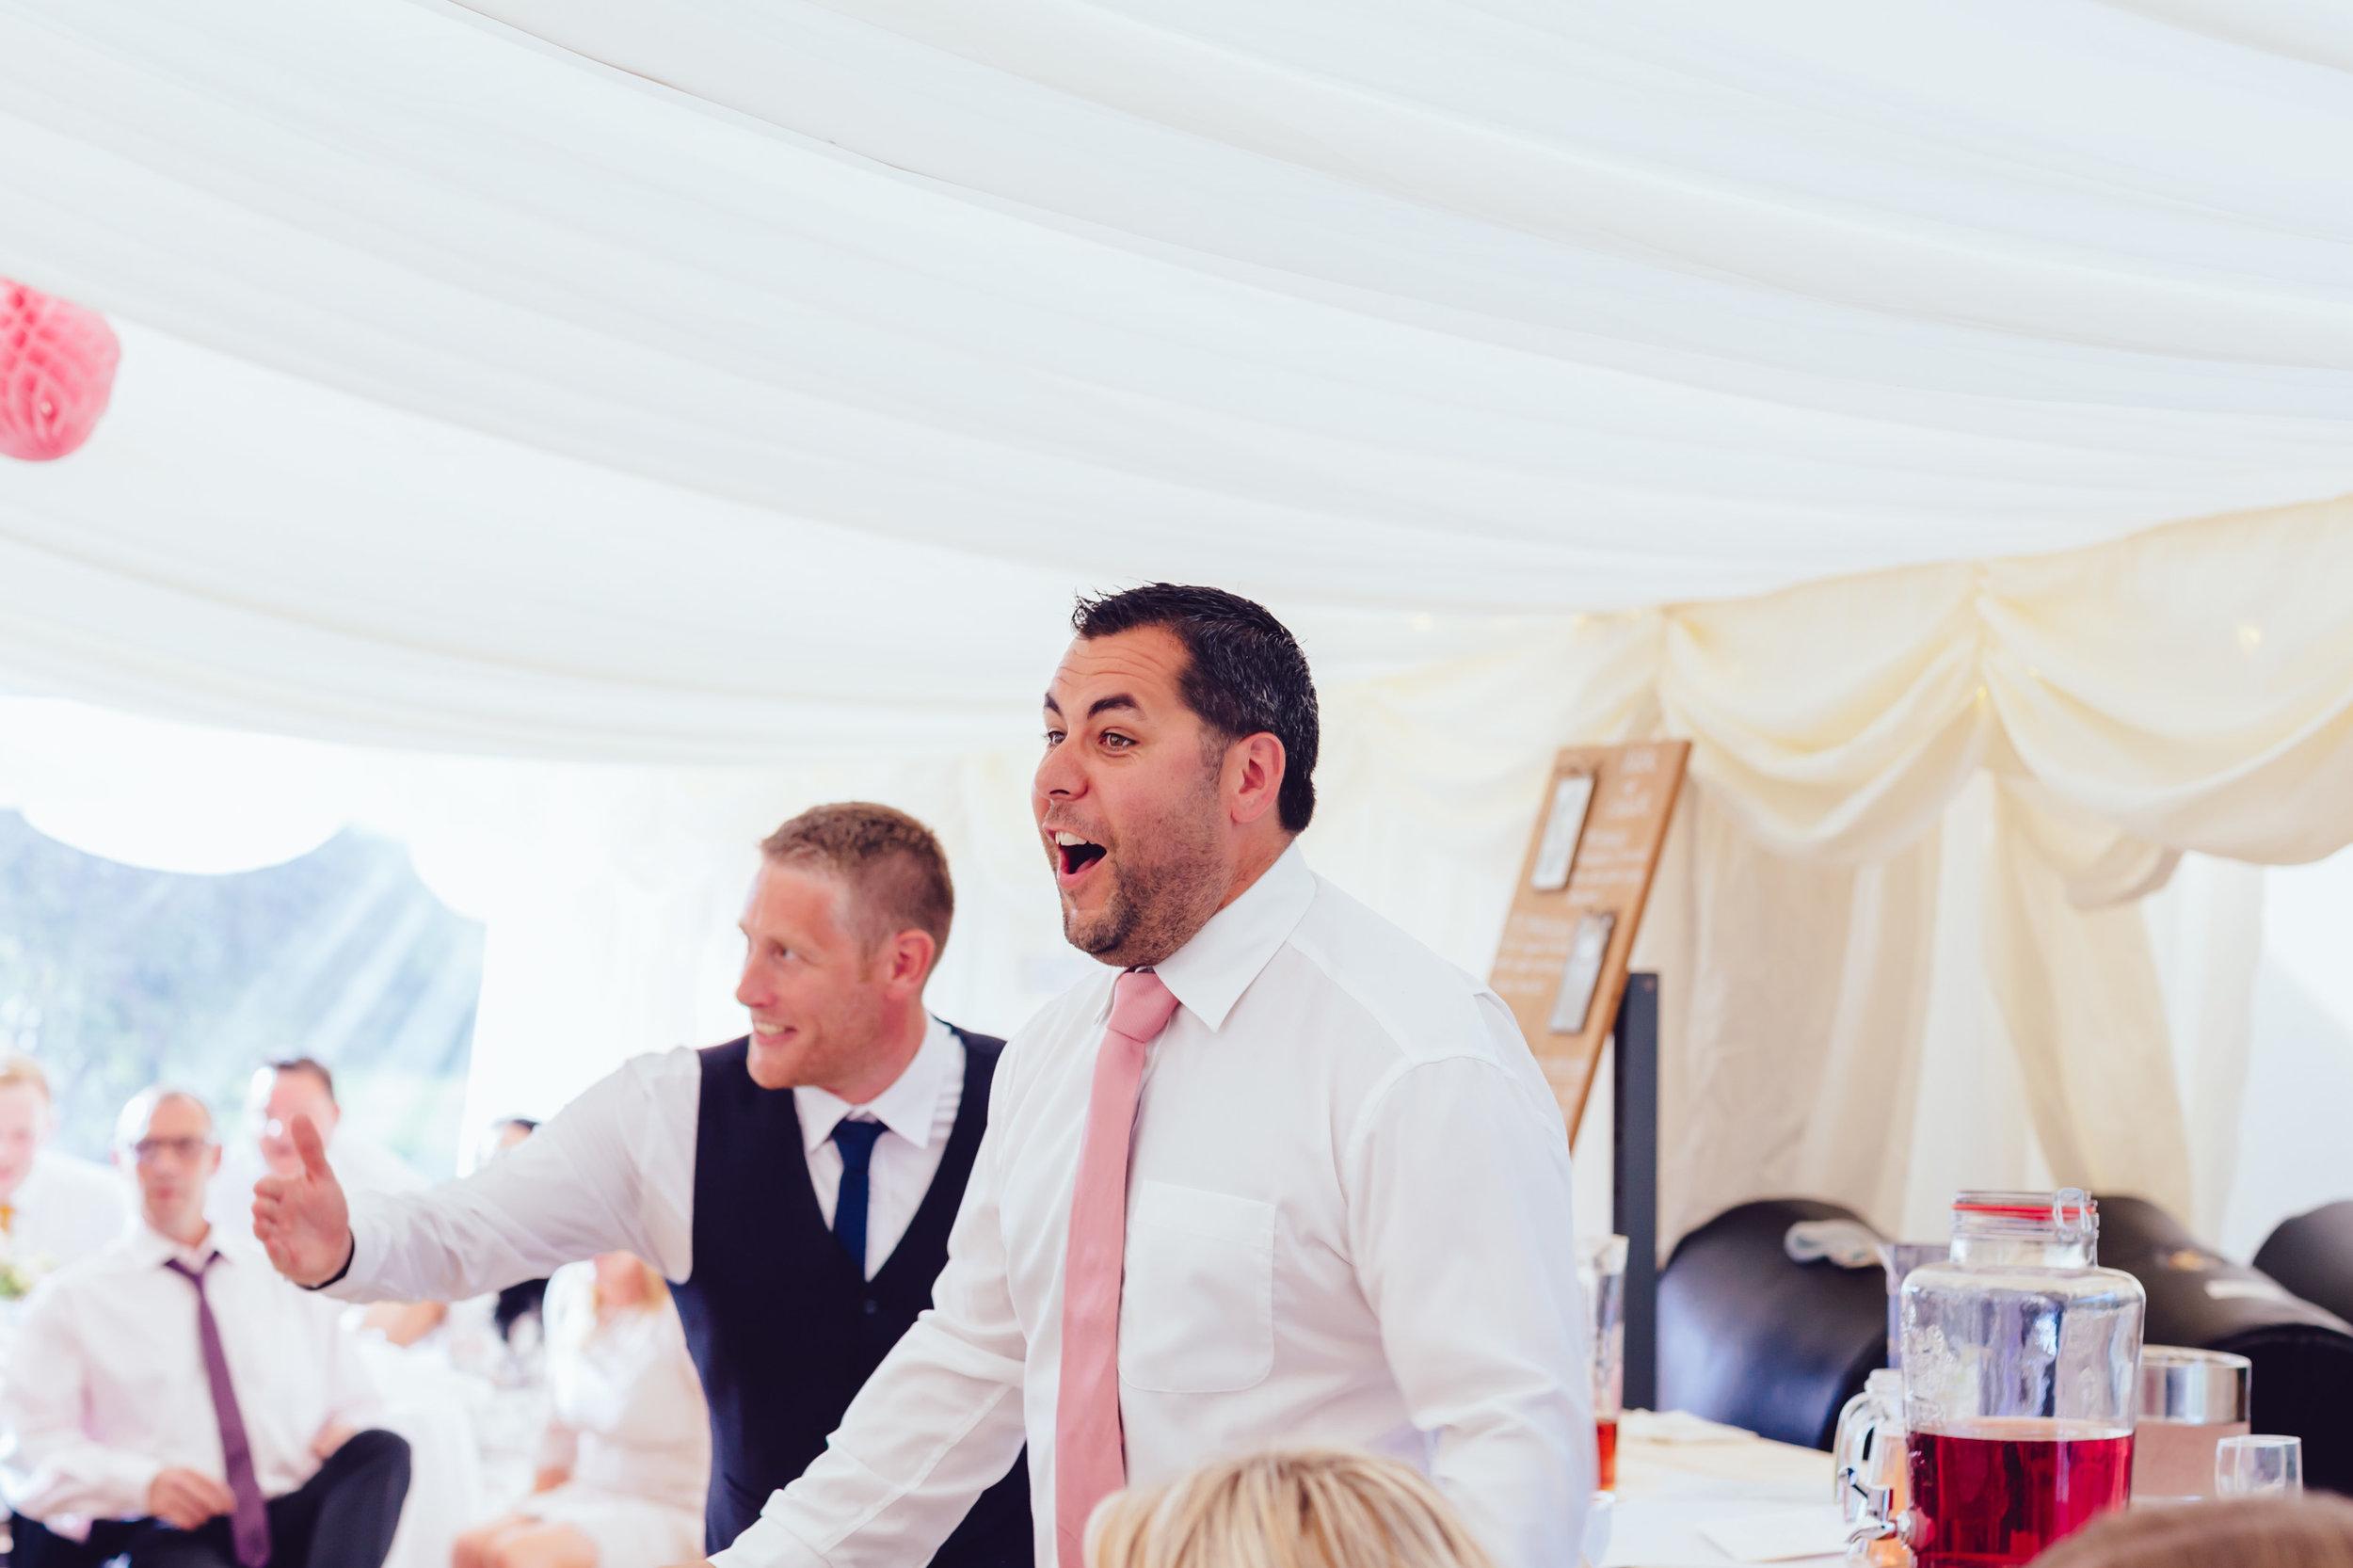 Birmingham photographer wedding country artistic wedding photography55.jpg